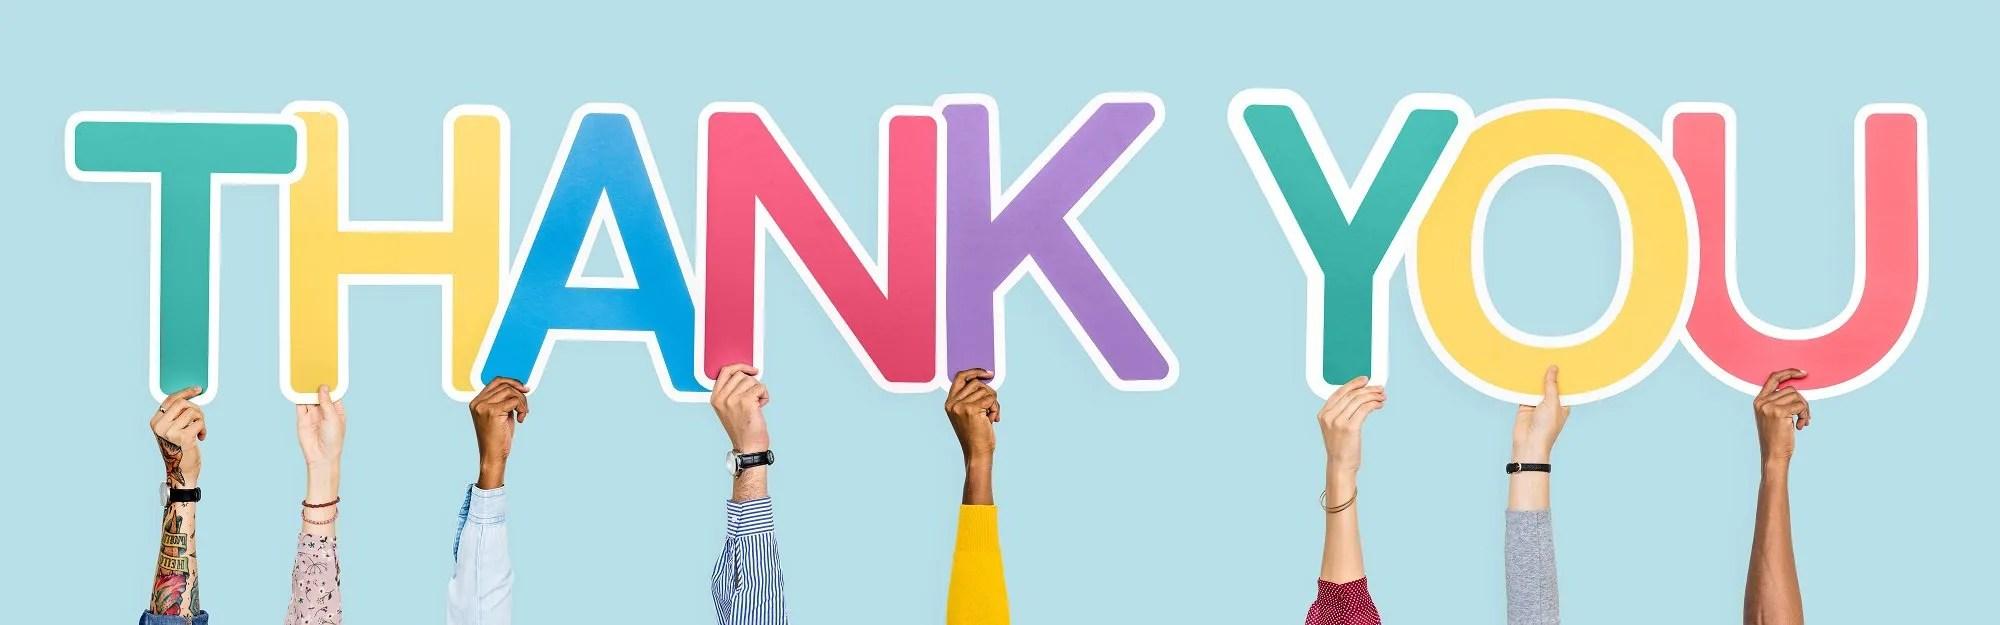 "Different ways to say ""thank you"" in Norwegian - Norwegian Academy"